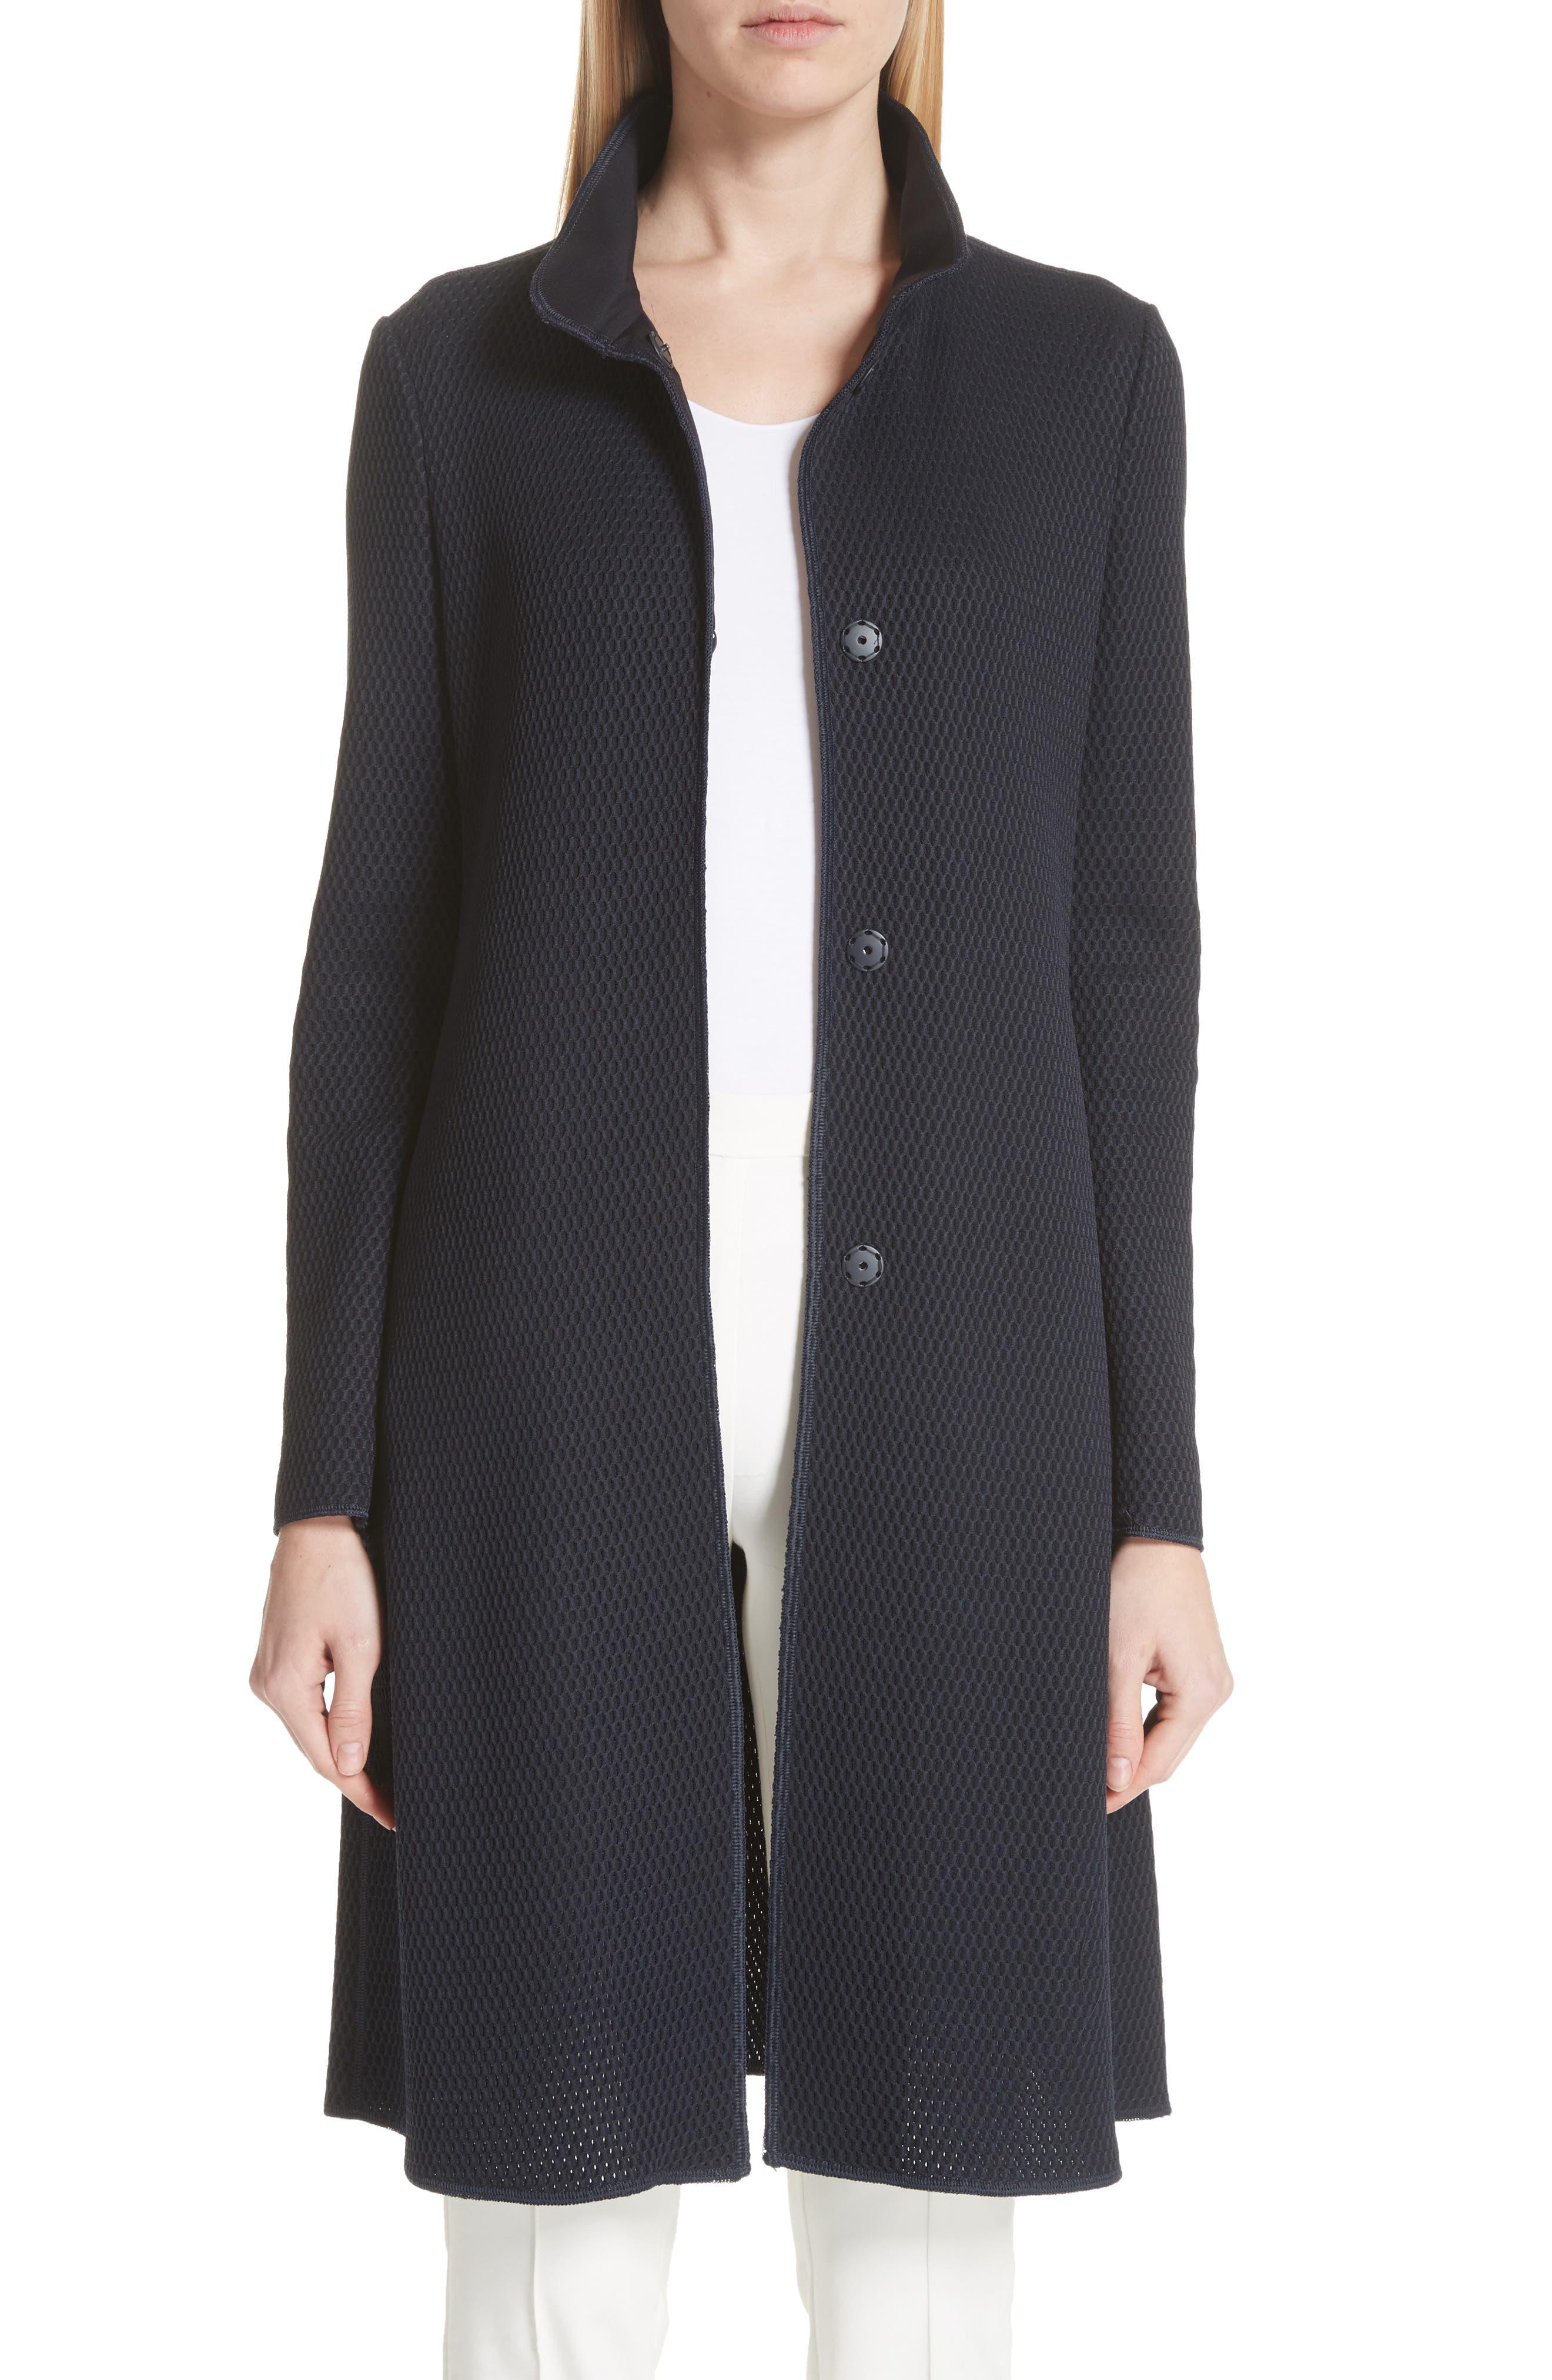 Honeycomb Knit Jersey Coat,                             Main thumbnail 1, color,                             Navy